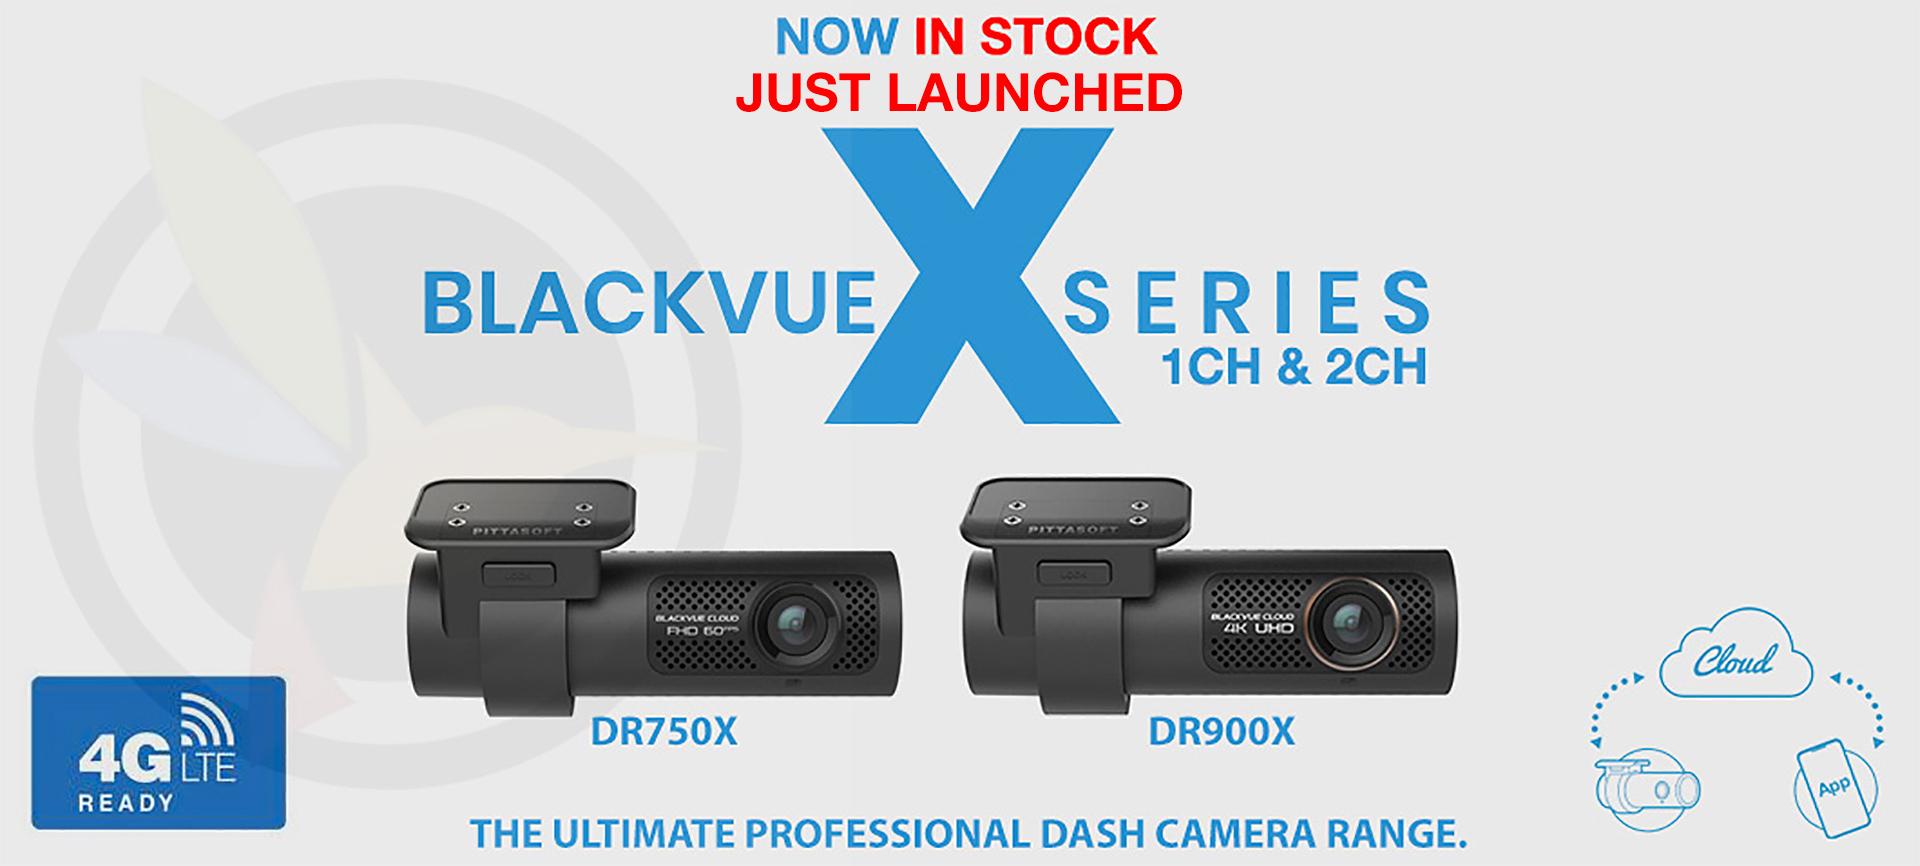 Blackvue New X Series Dash Camera Range